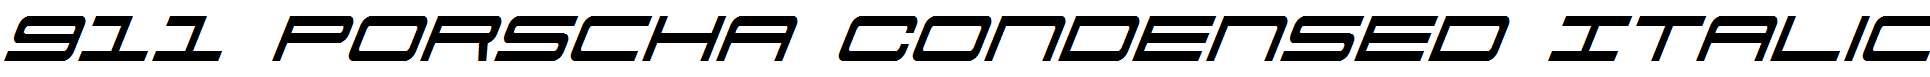 911-Porscha-Condensed-Italic